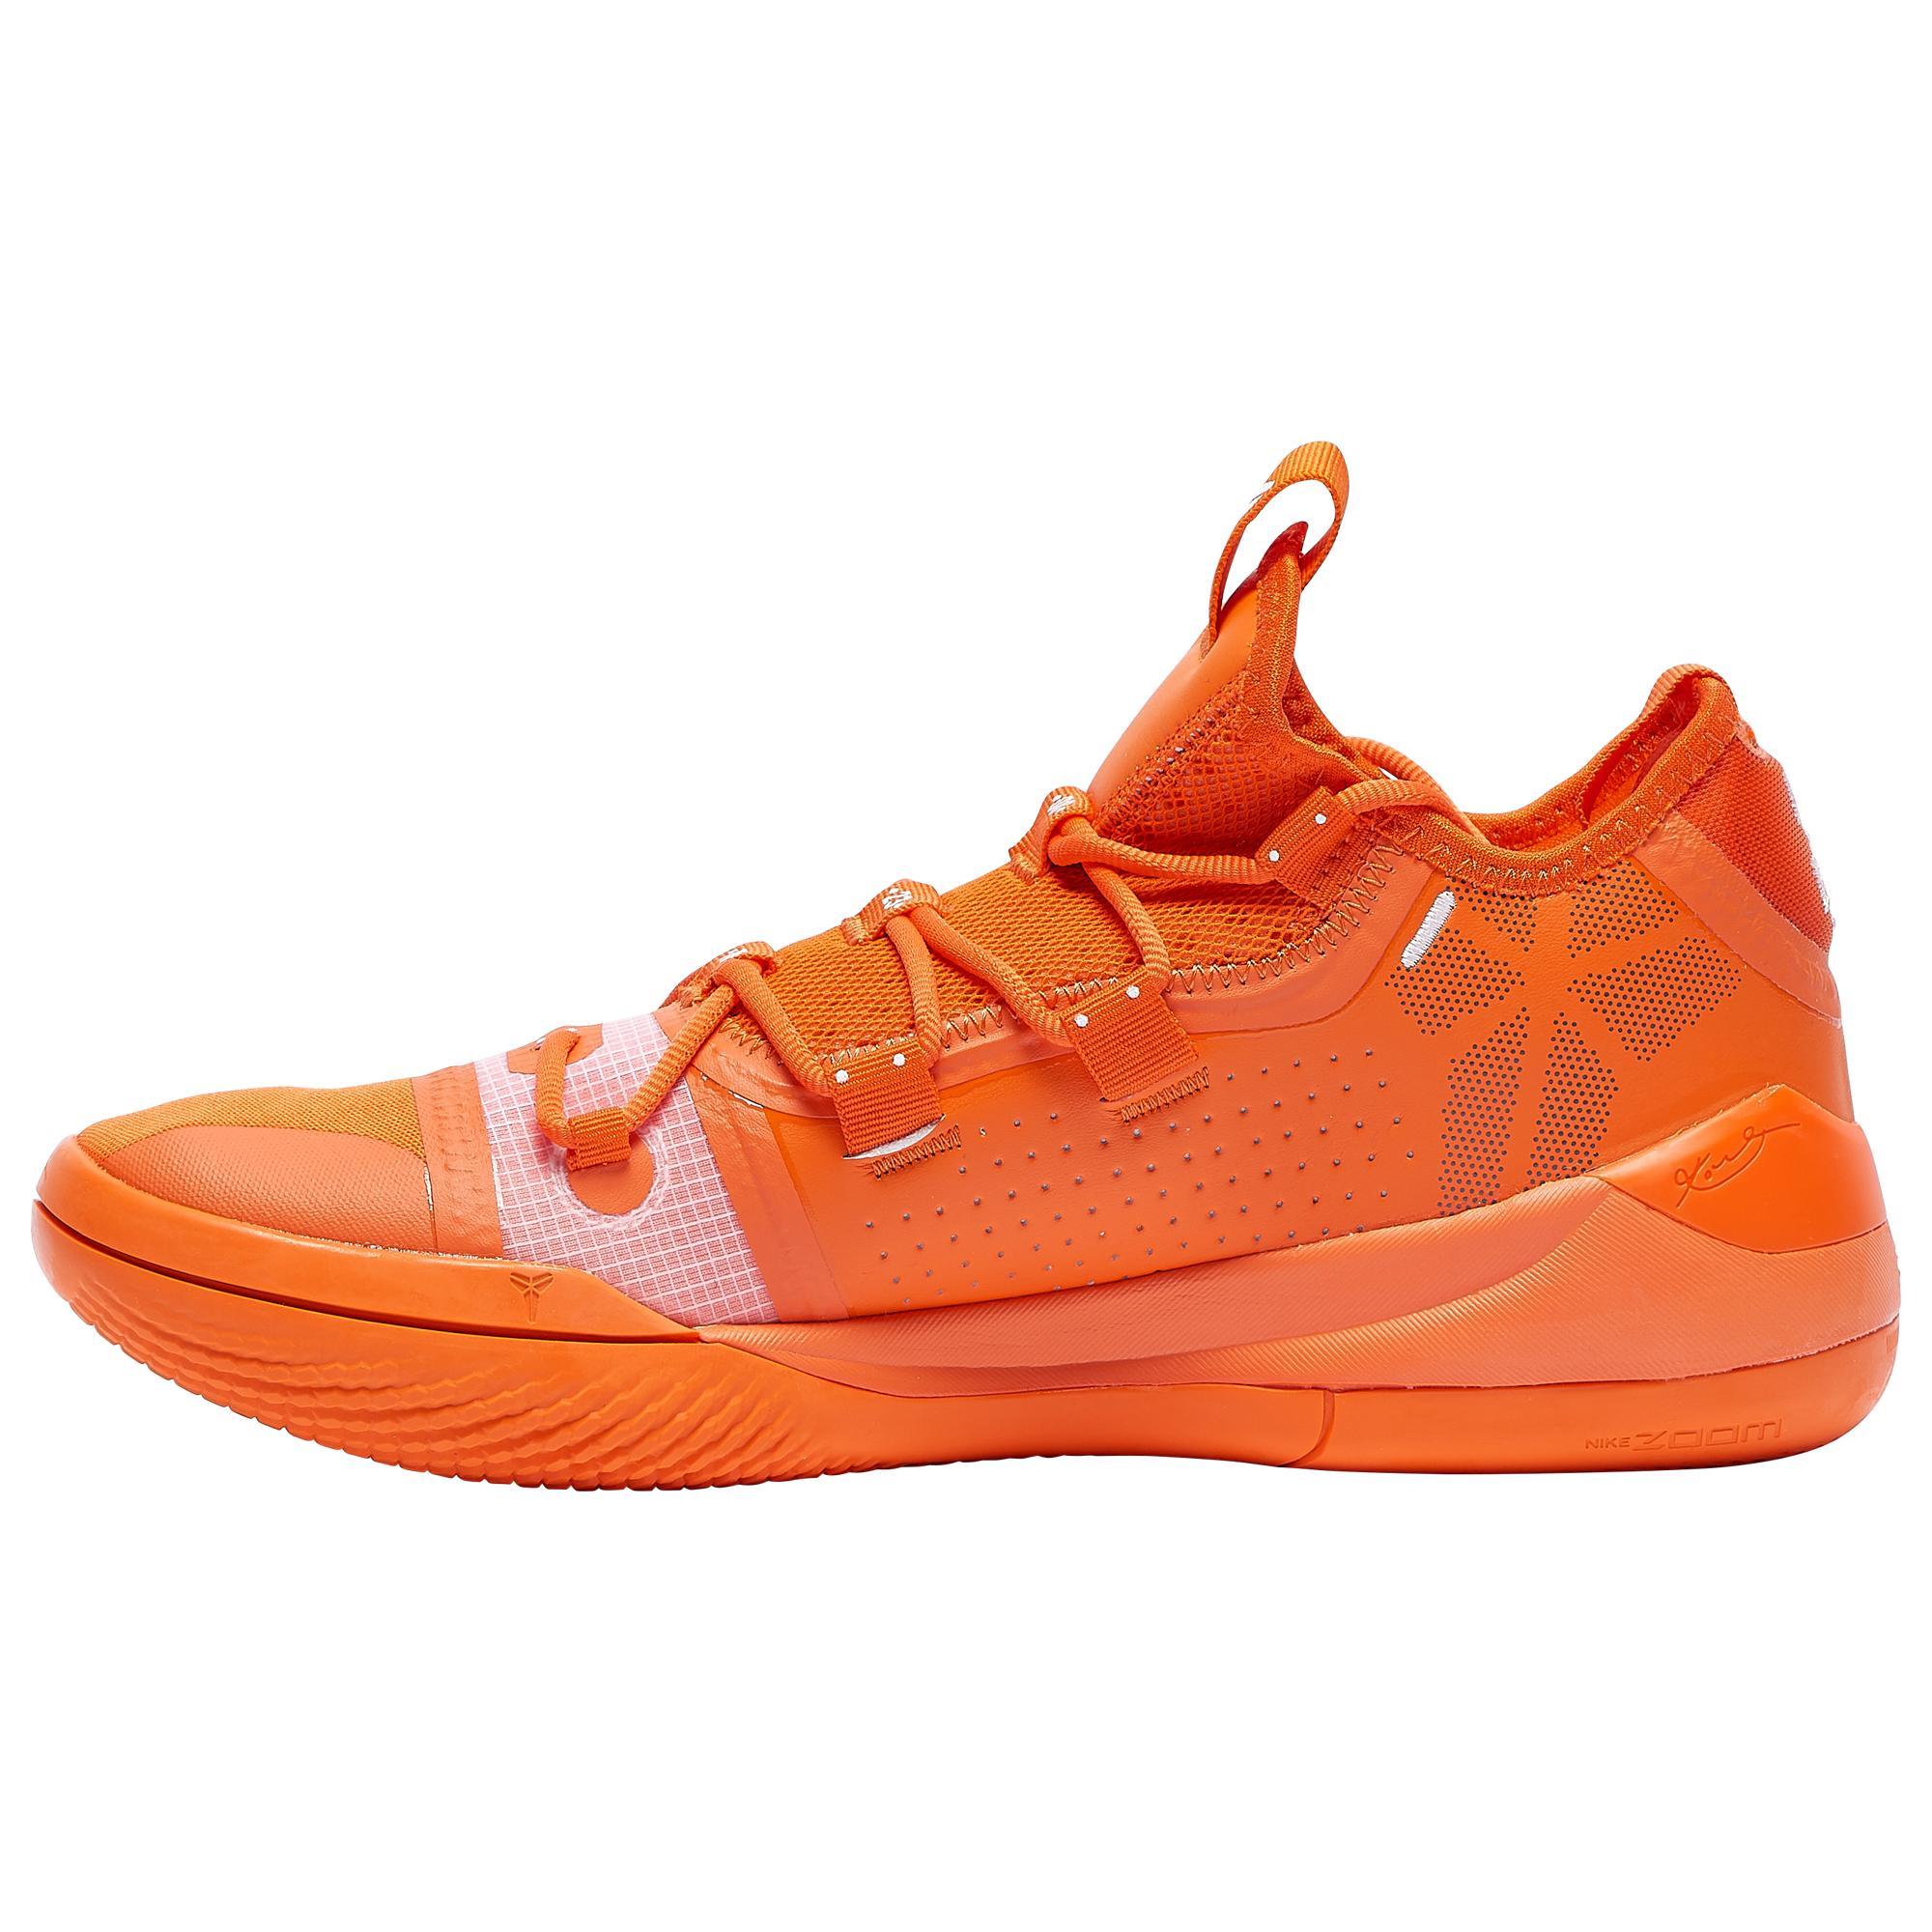 promo code ceb2e 68d9d Men's Orange Kobe Ad Basketball Shoes